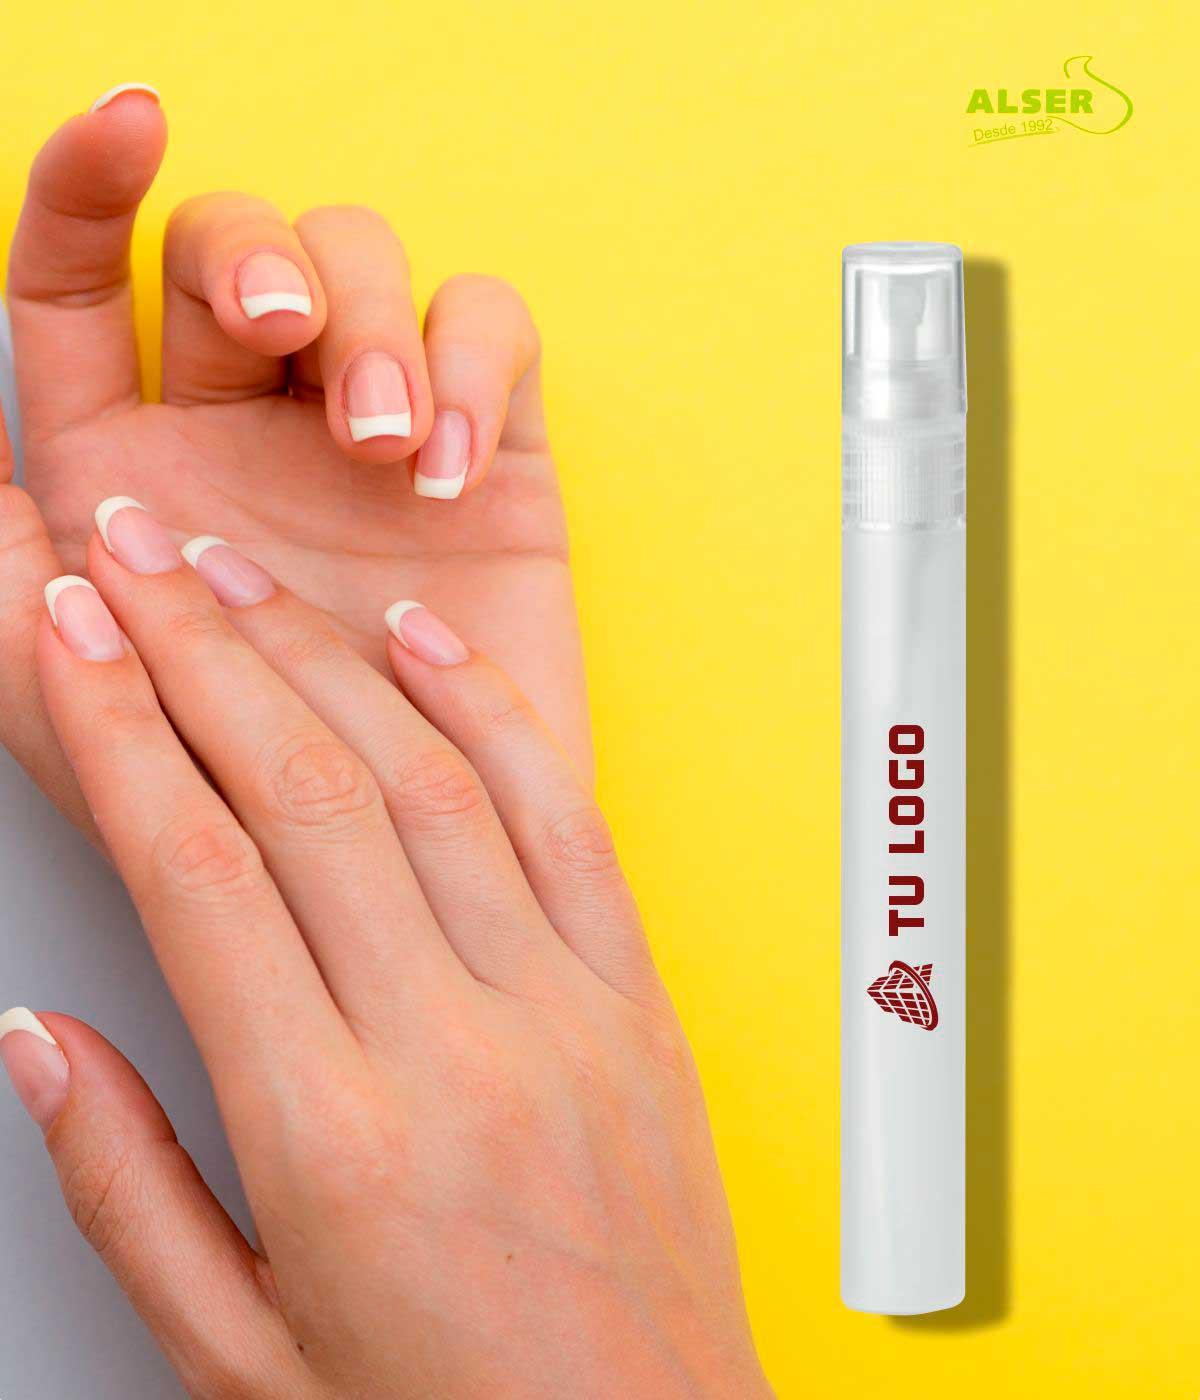 spray de manos desinfectante para personalizar